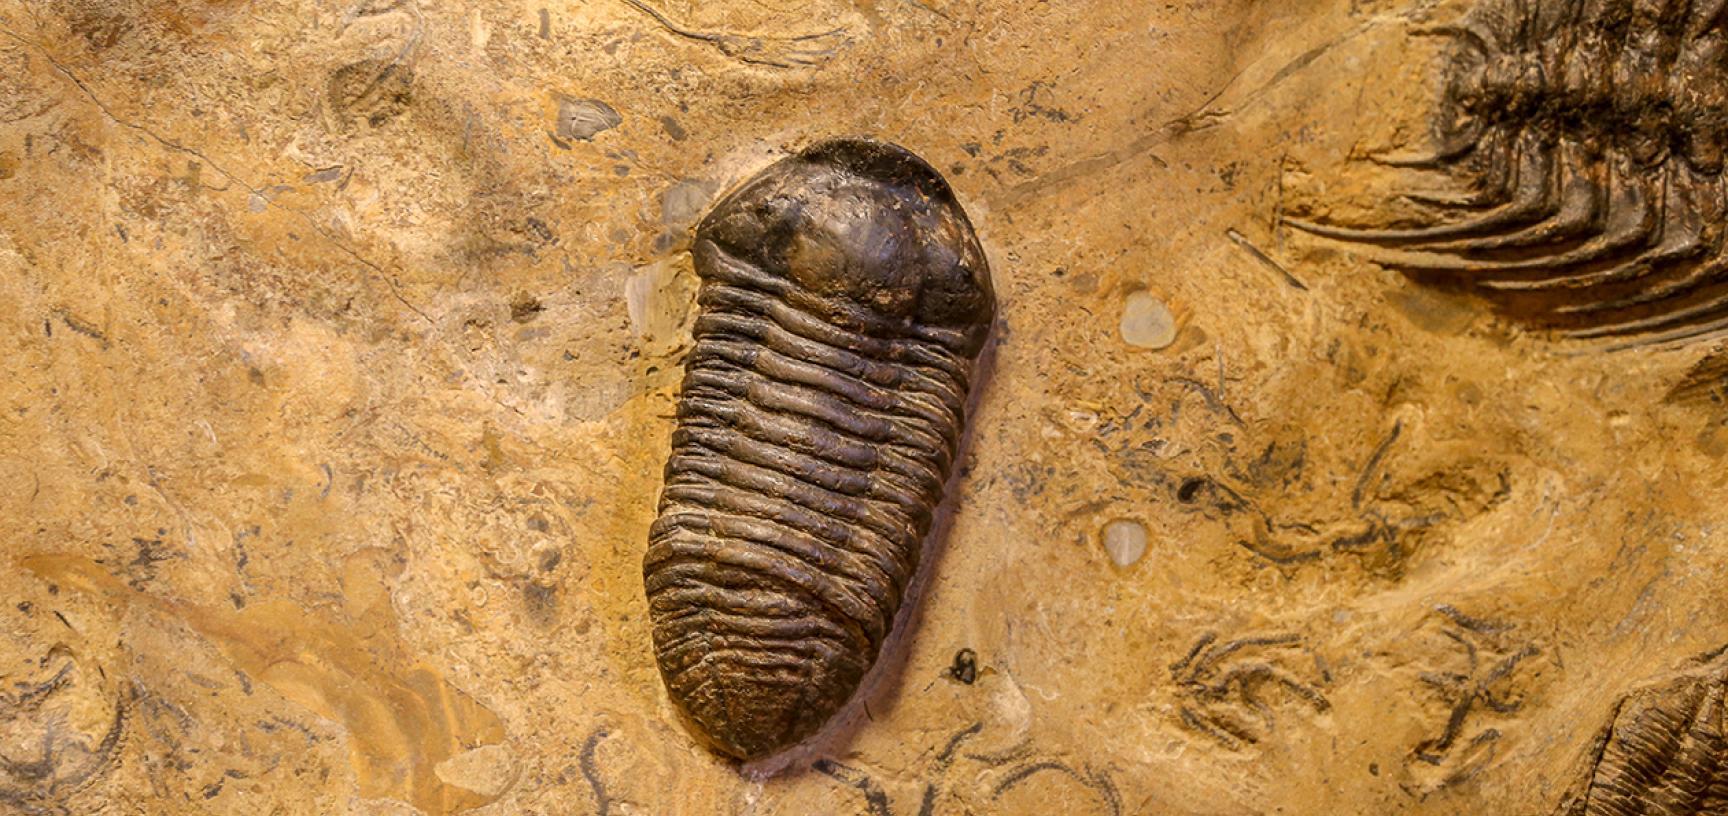 Calymenella trilobite